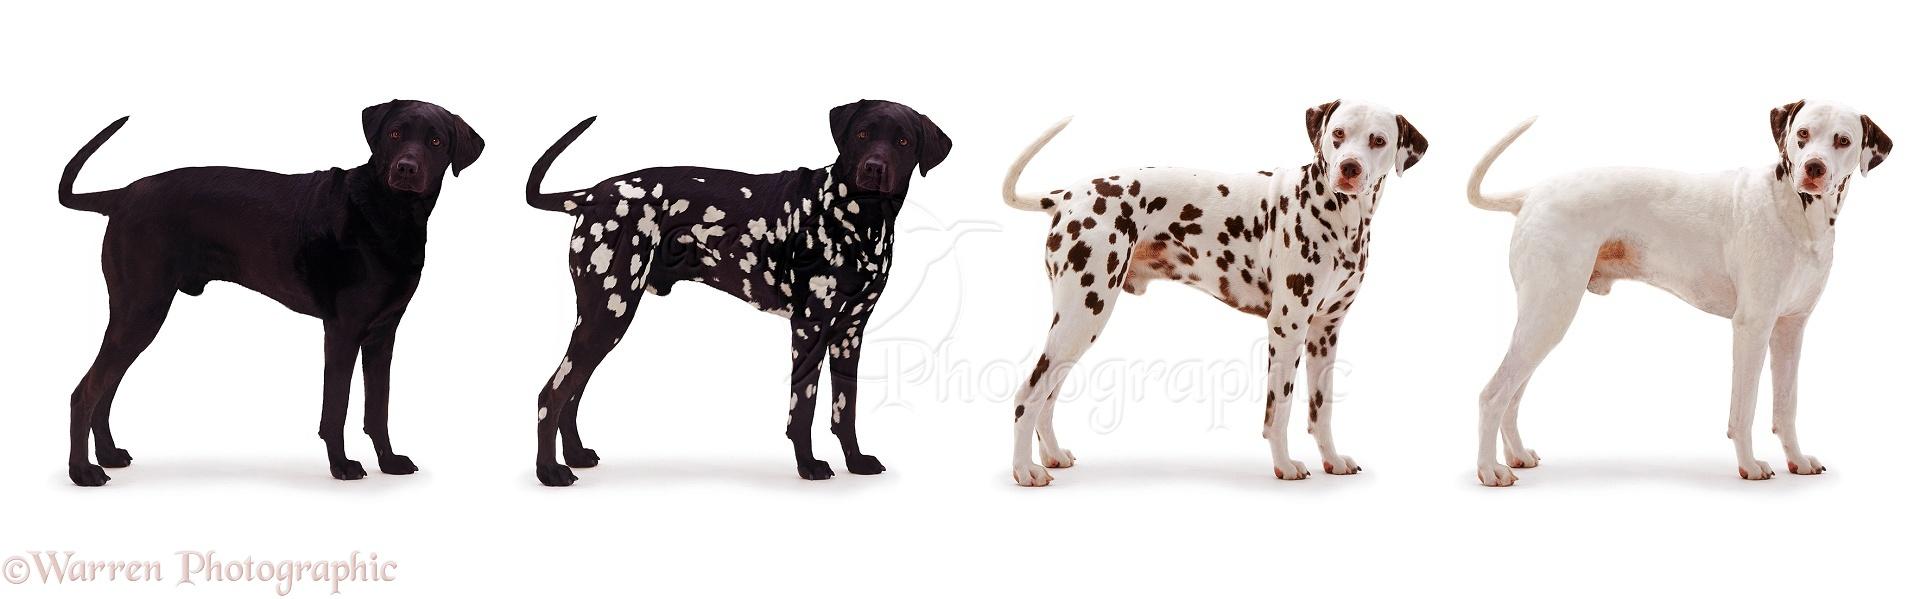 Dogs: Black and white Dalmatian photo - WP04943